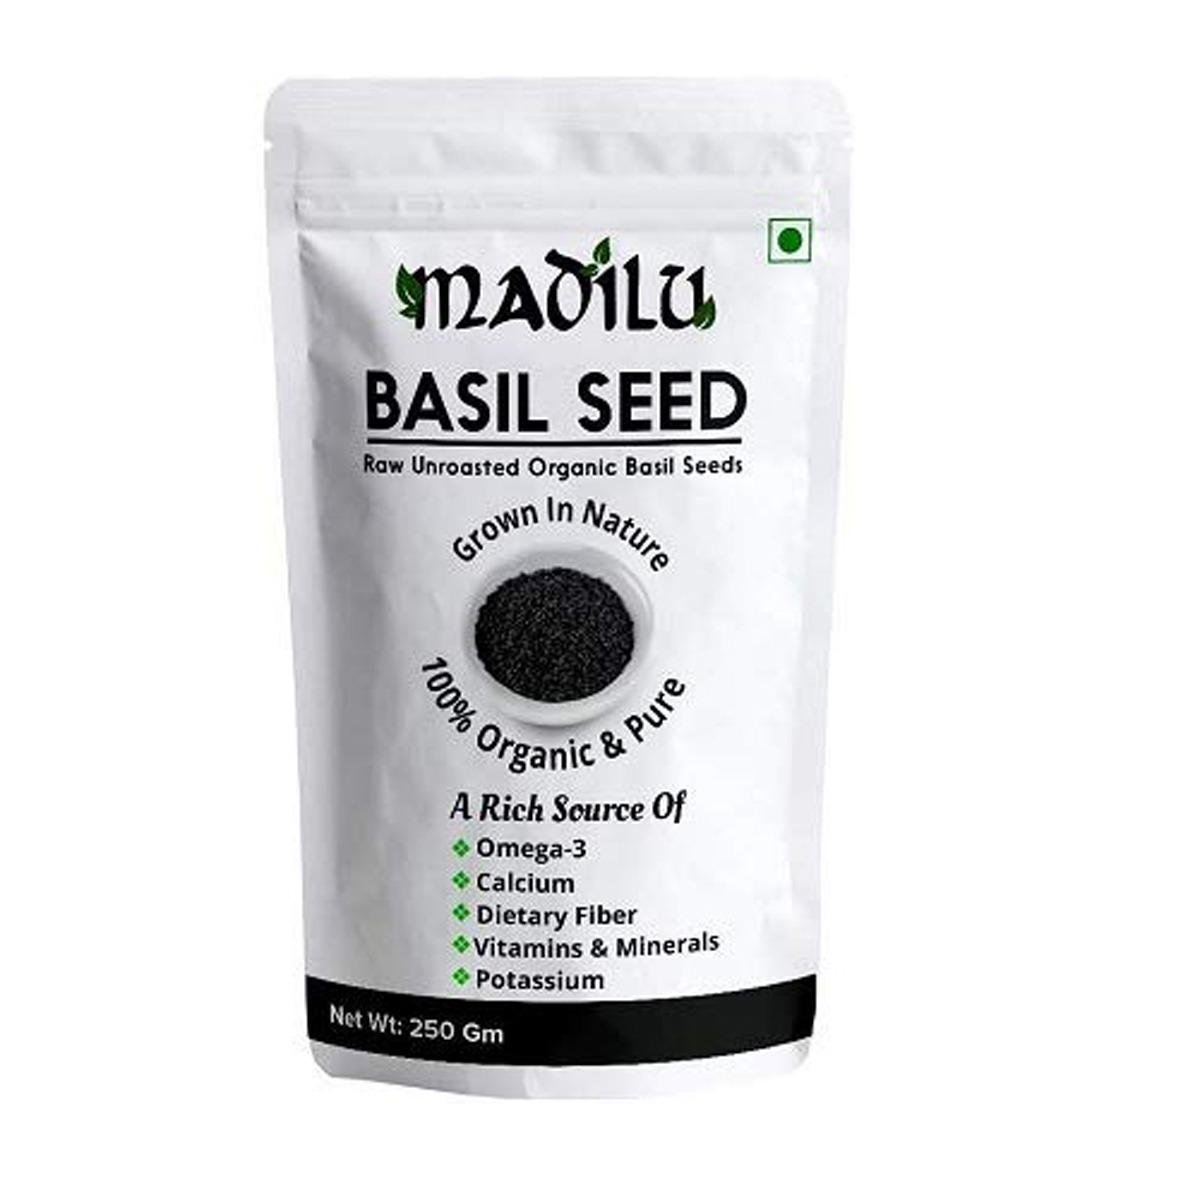 BASIL SEEDS BY MADILU